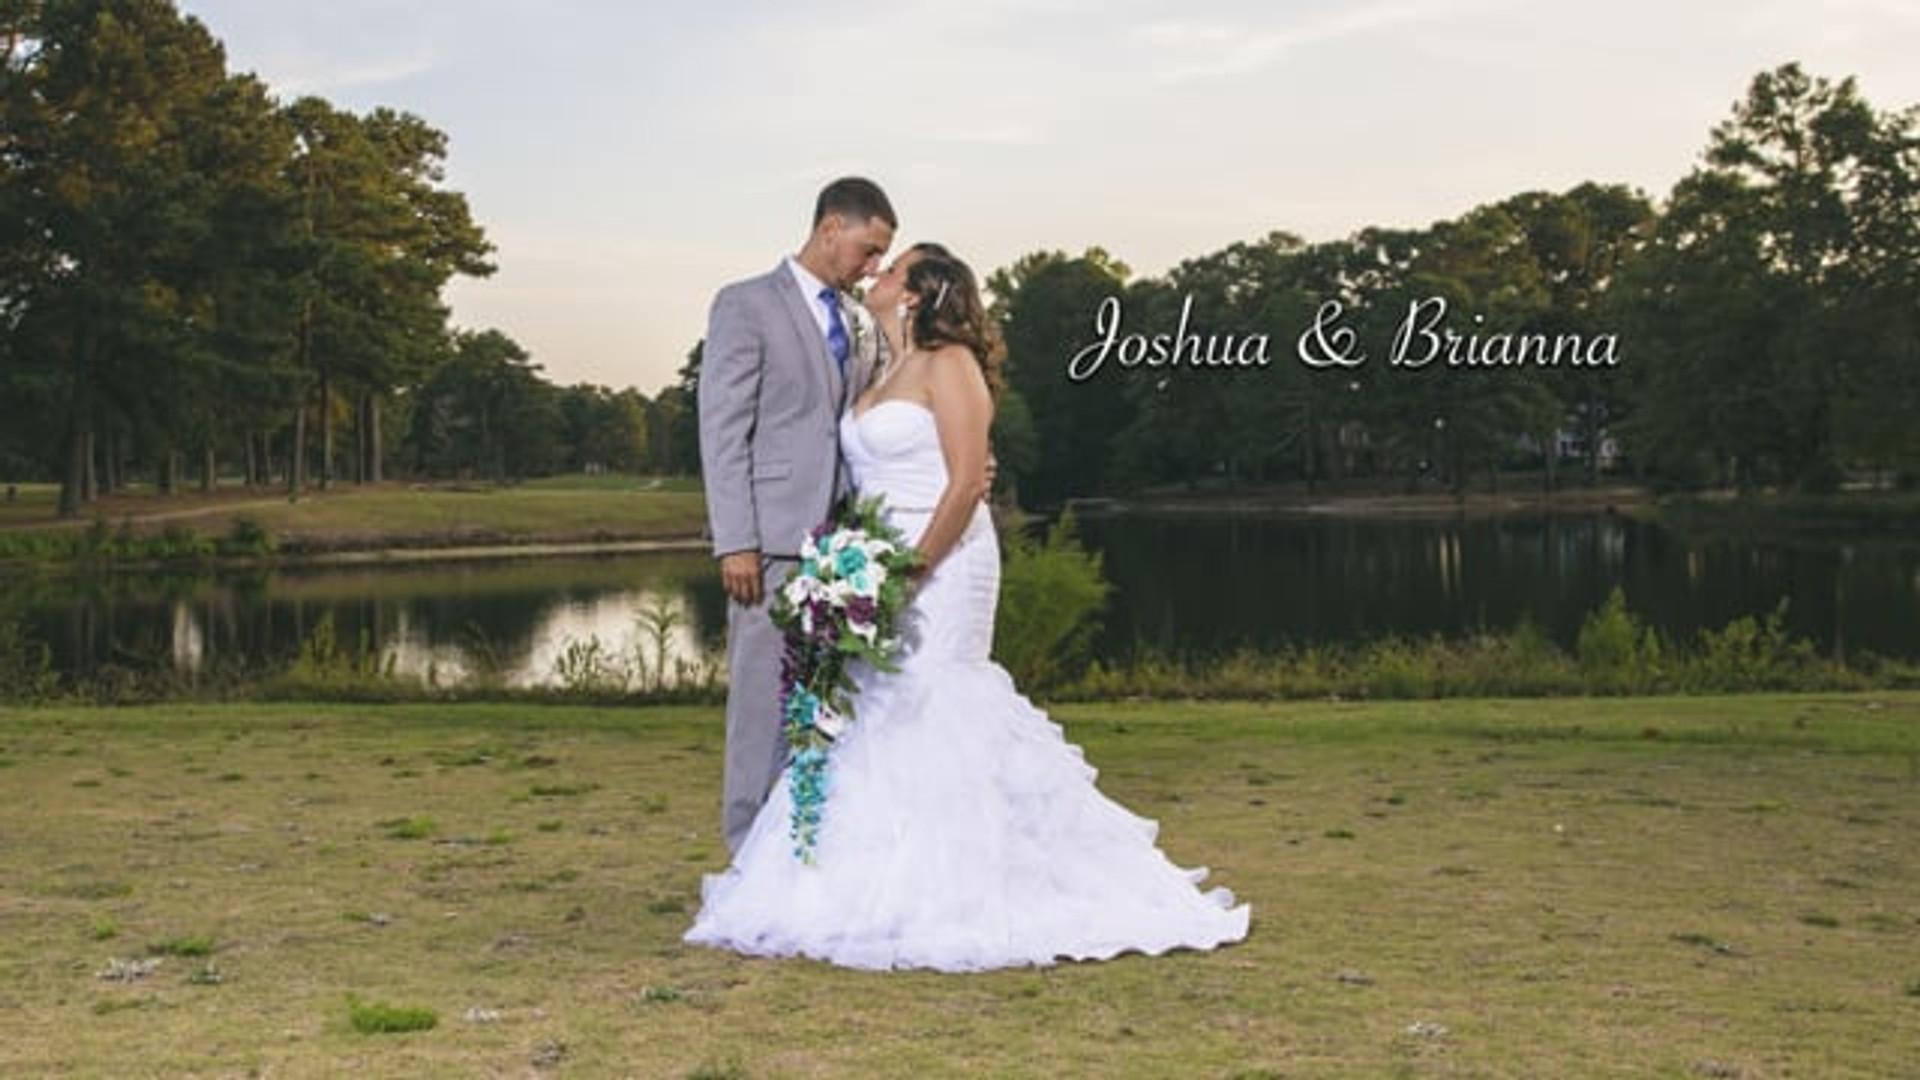 Joshua & Brianna